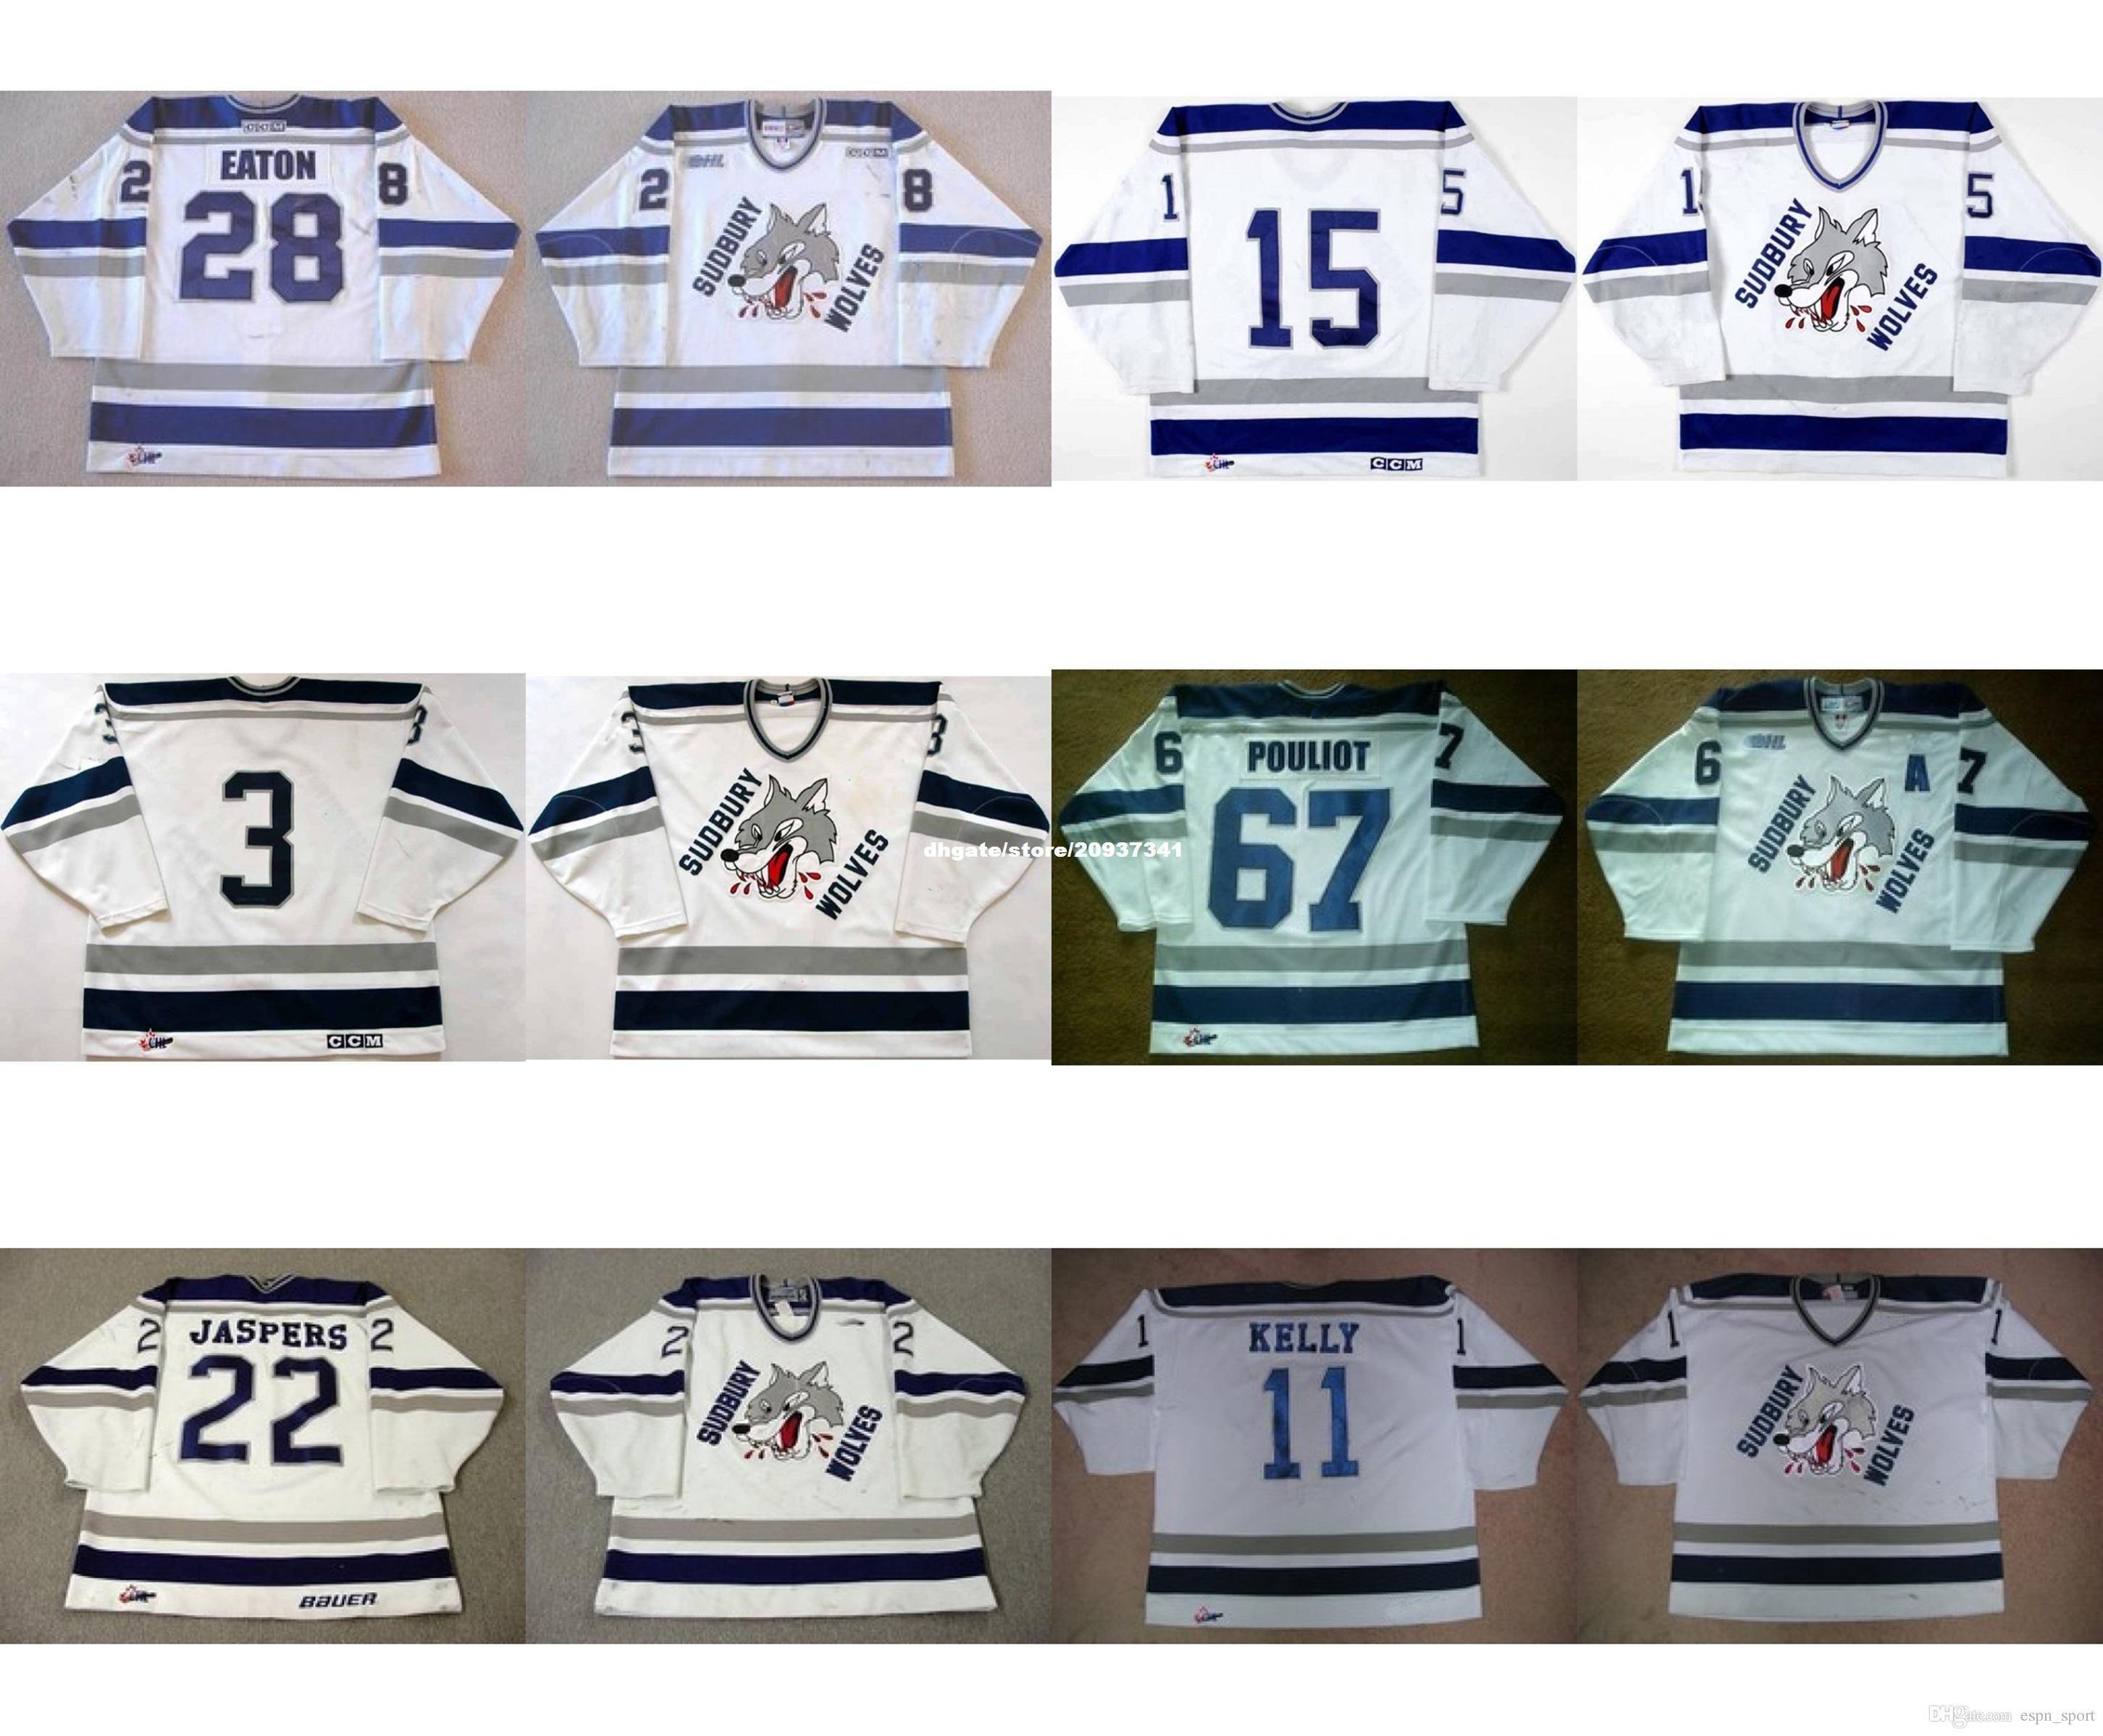 custom Customize OHL Sudbury Wolves Jersey Mens Womens Kids 3 Matthew Hodges 15 Kevin Beaumont 22 Jason Jaspers Hockey Jerseys Goalit Cut